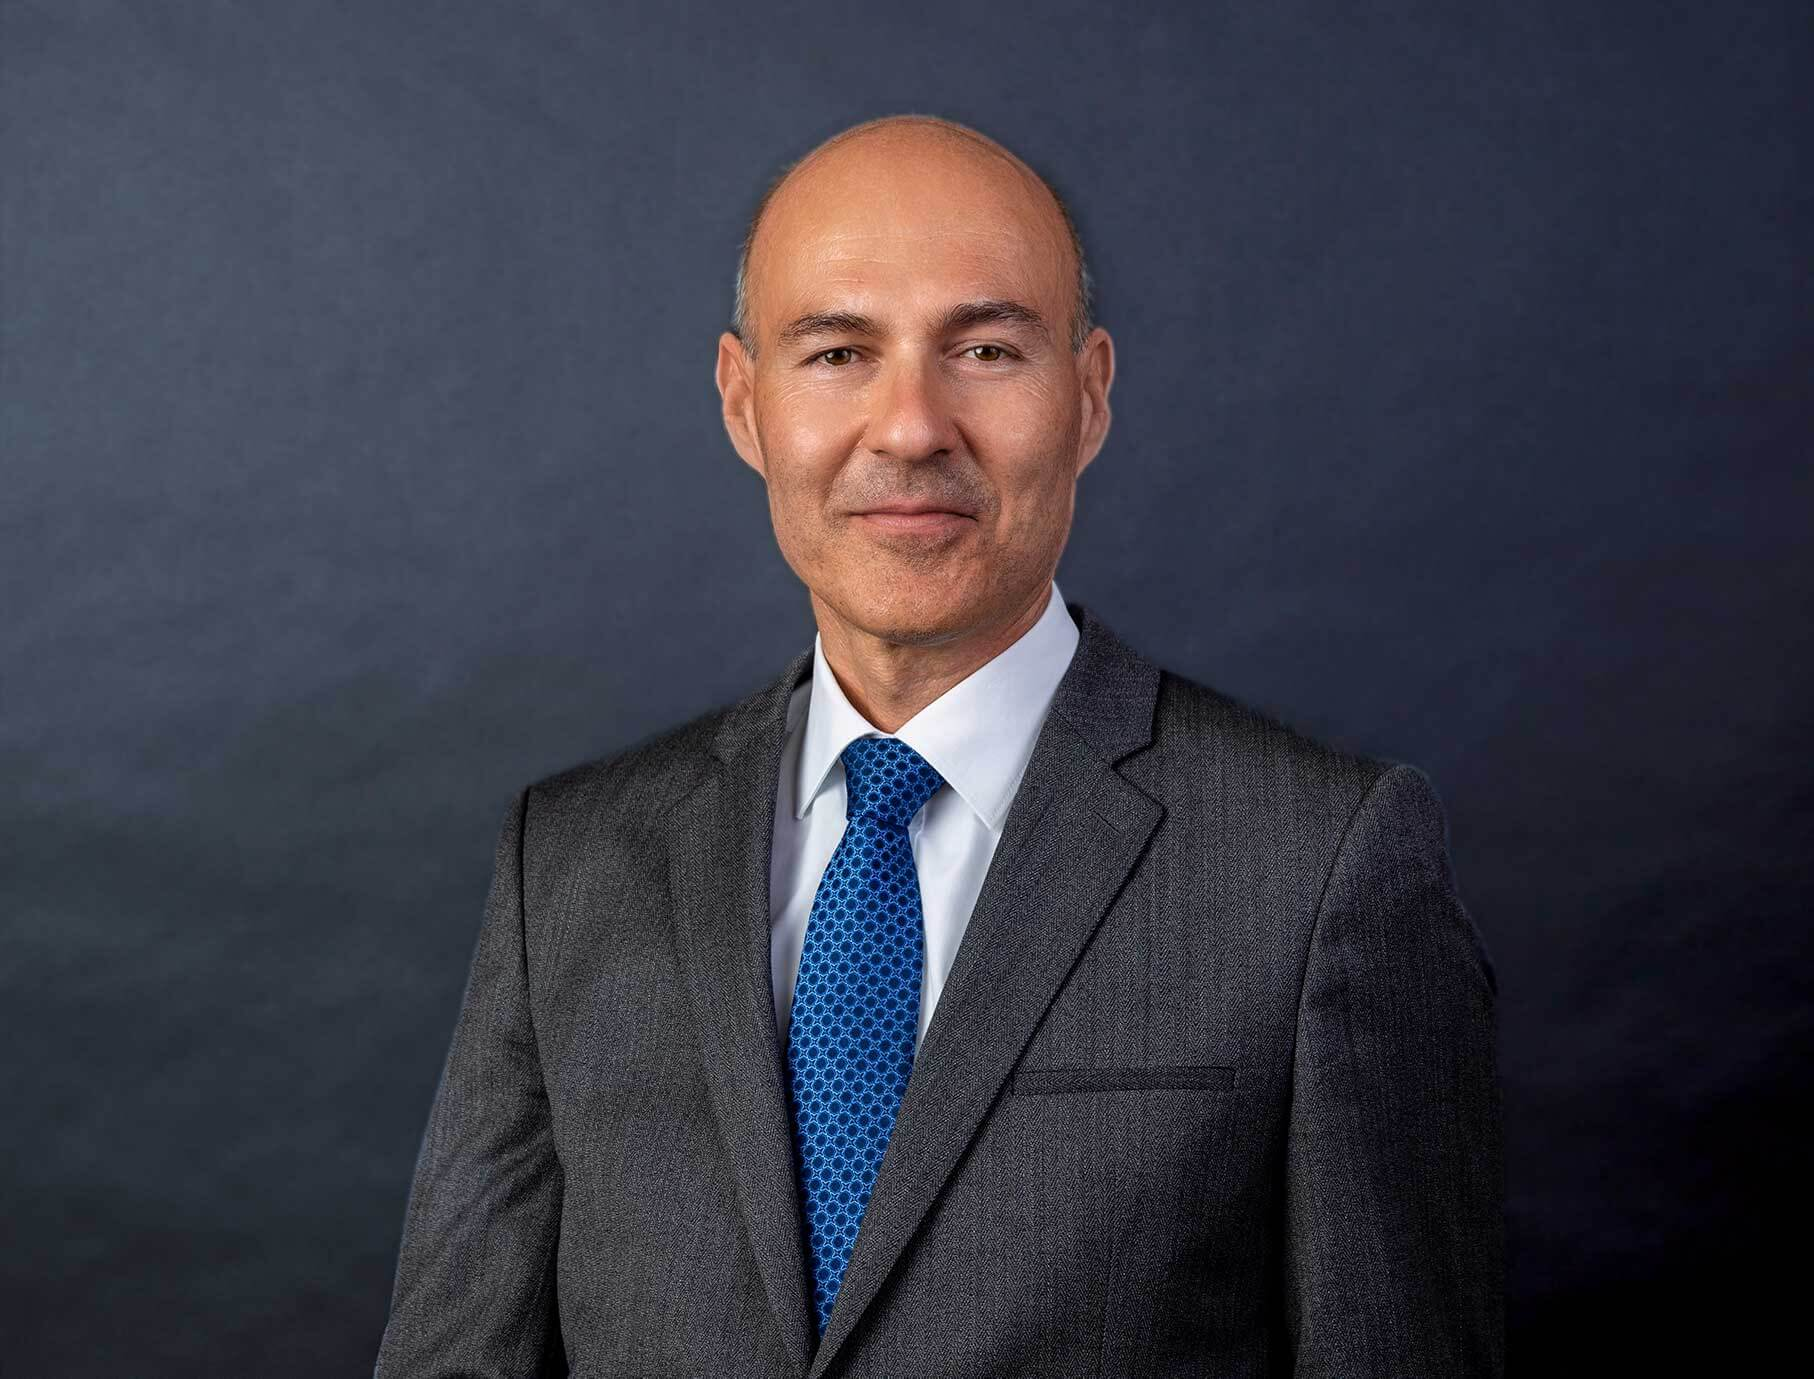 Rechtsanwalt Dr. Mario Mittler-Profilbild